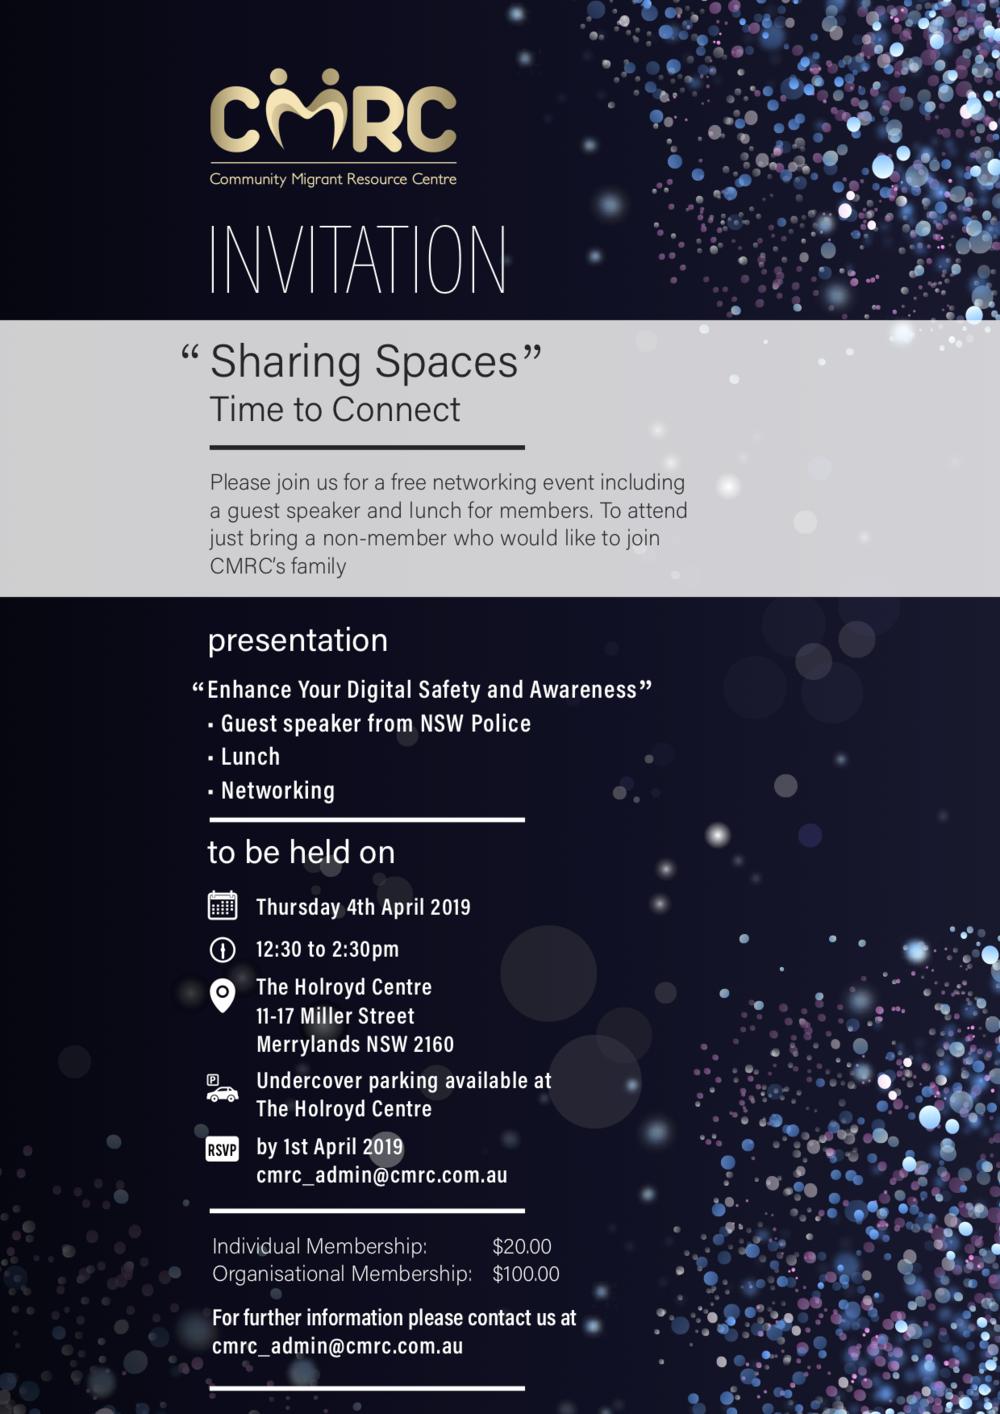 CMRC-Membership Invitation-April-2019-A4.png